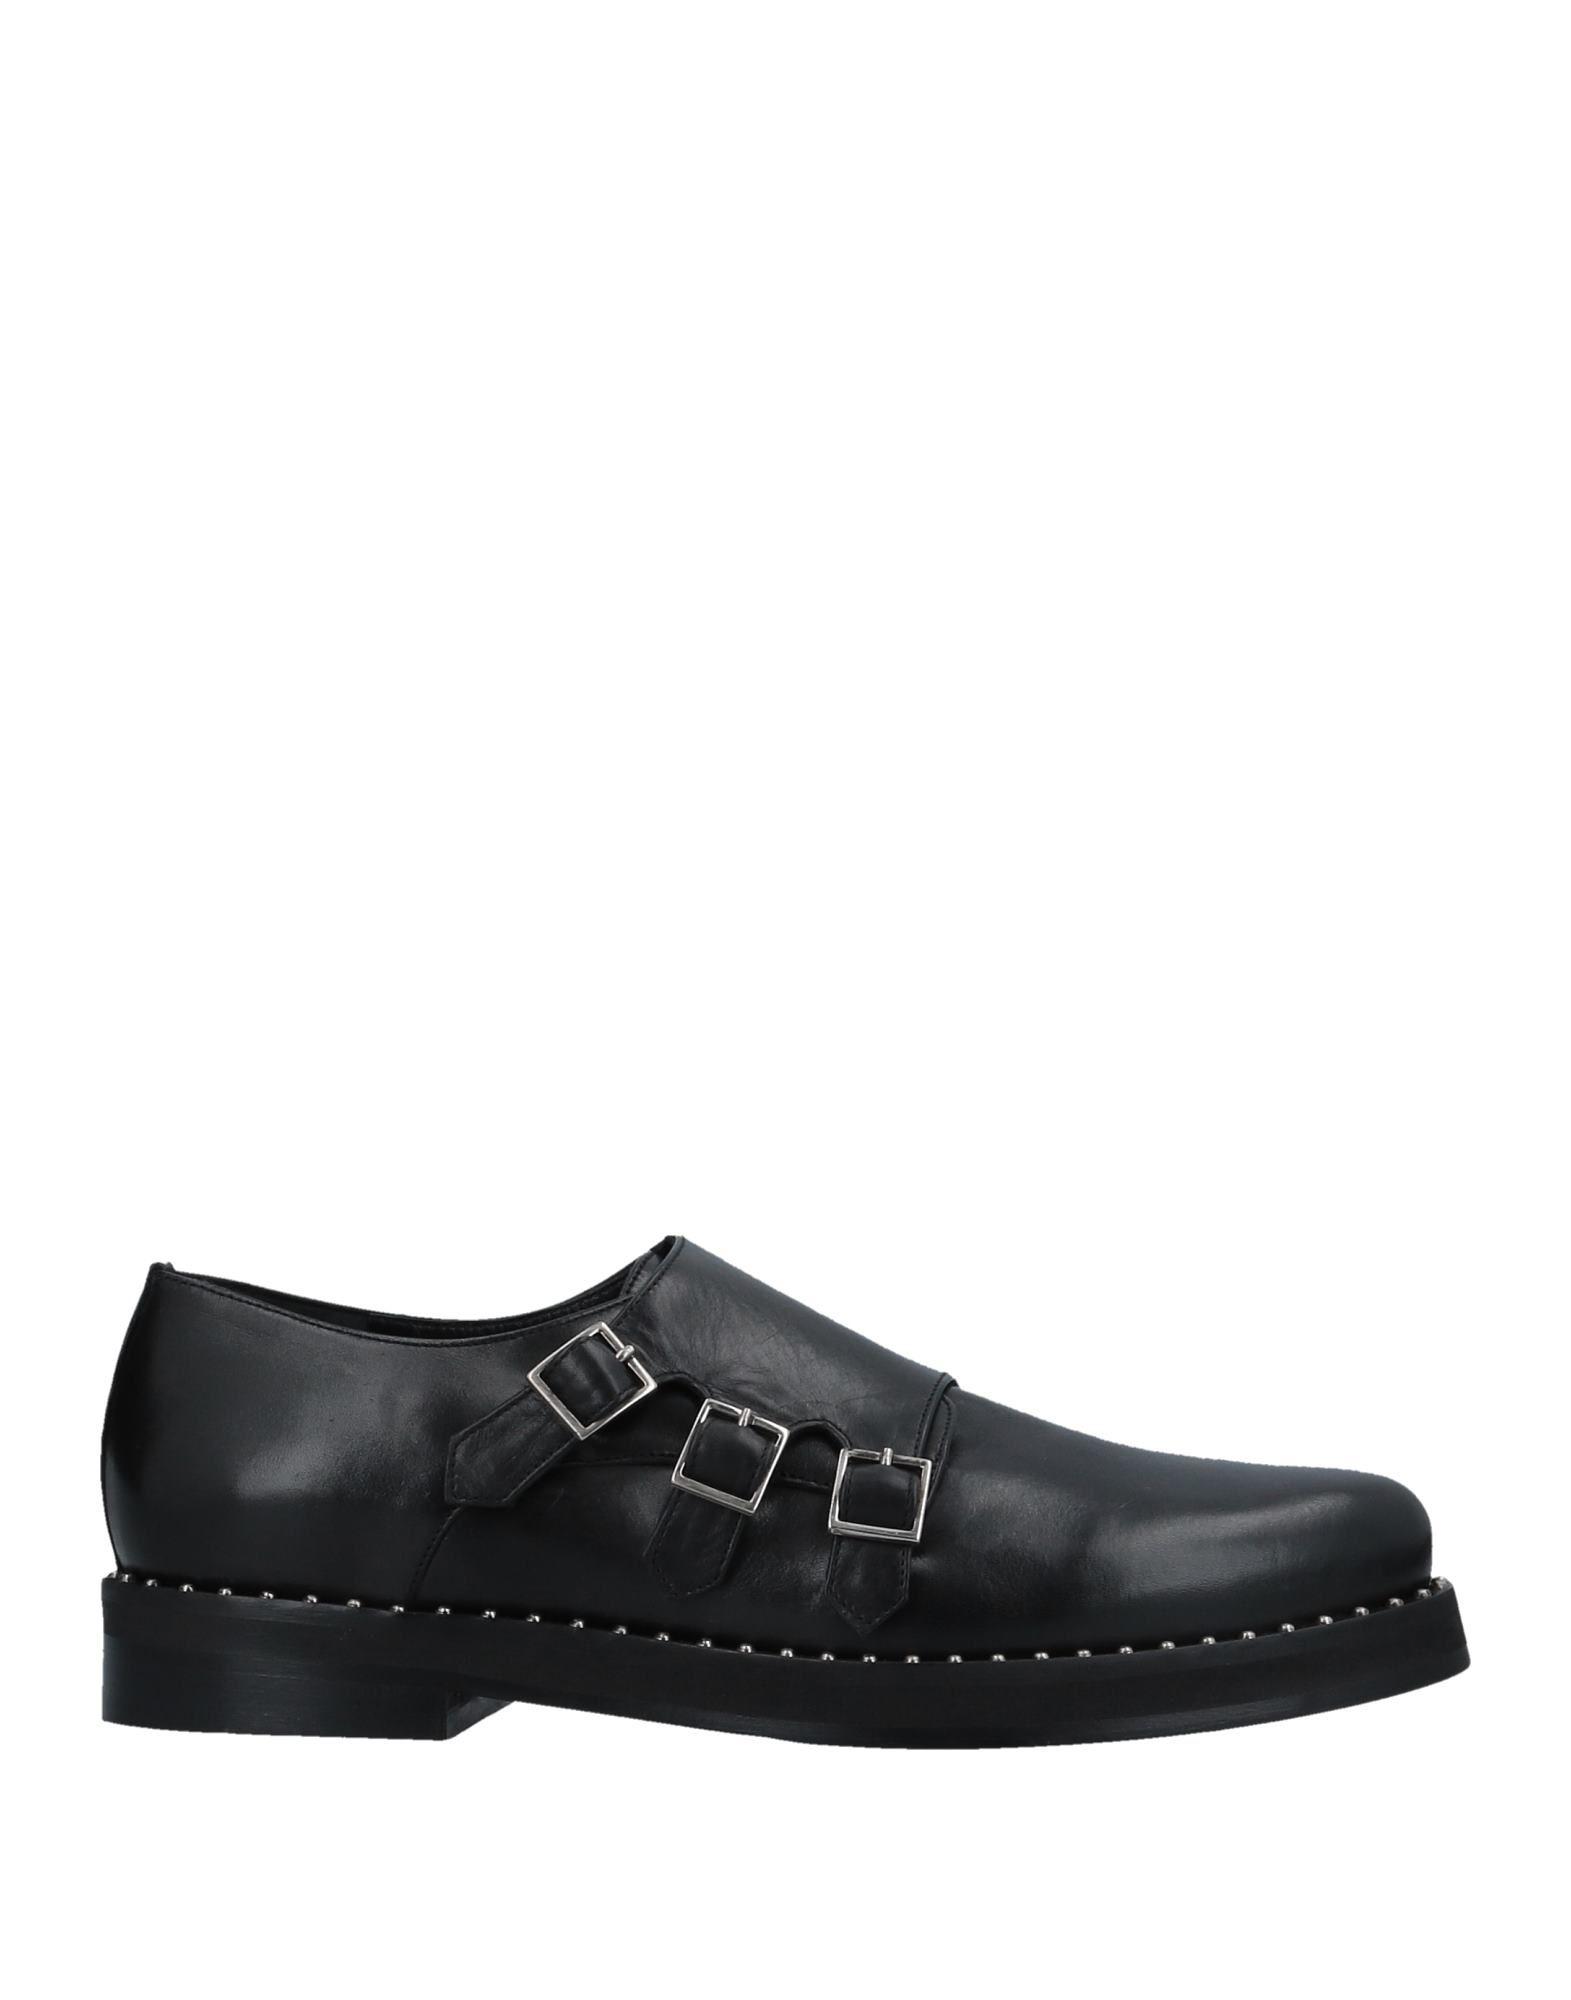 Eglantine Mokassins Damen  11507729BO Gute Qualität beliebte Schuhe